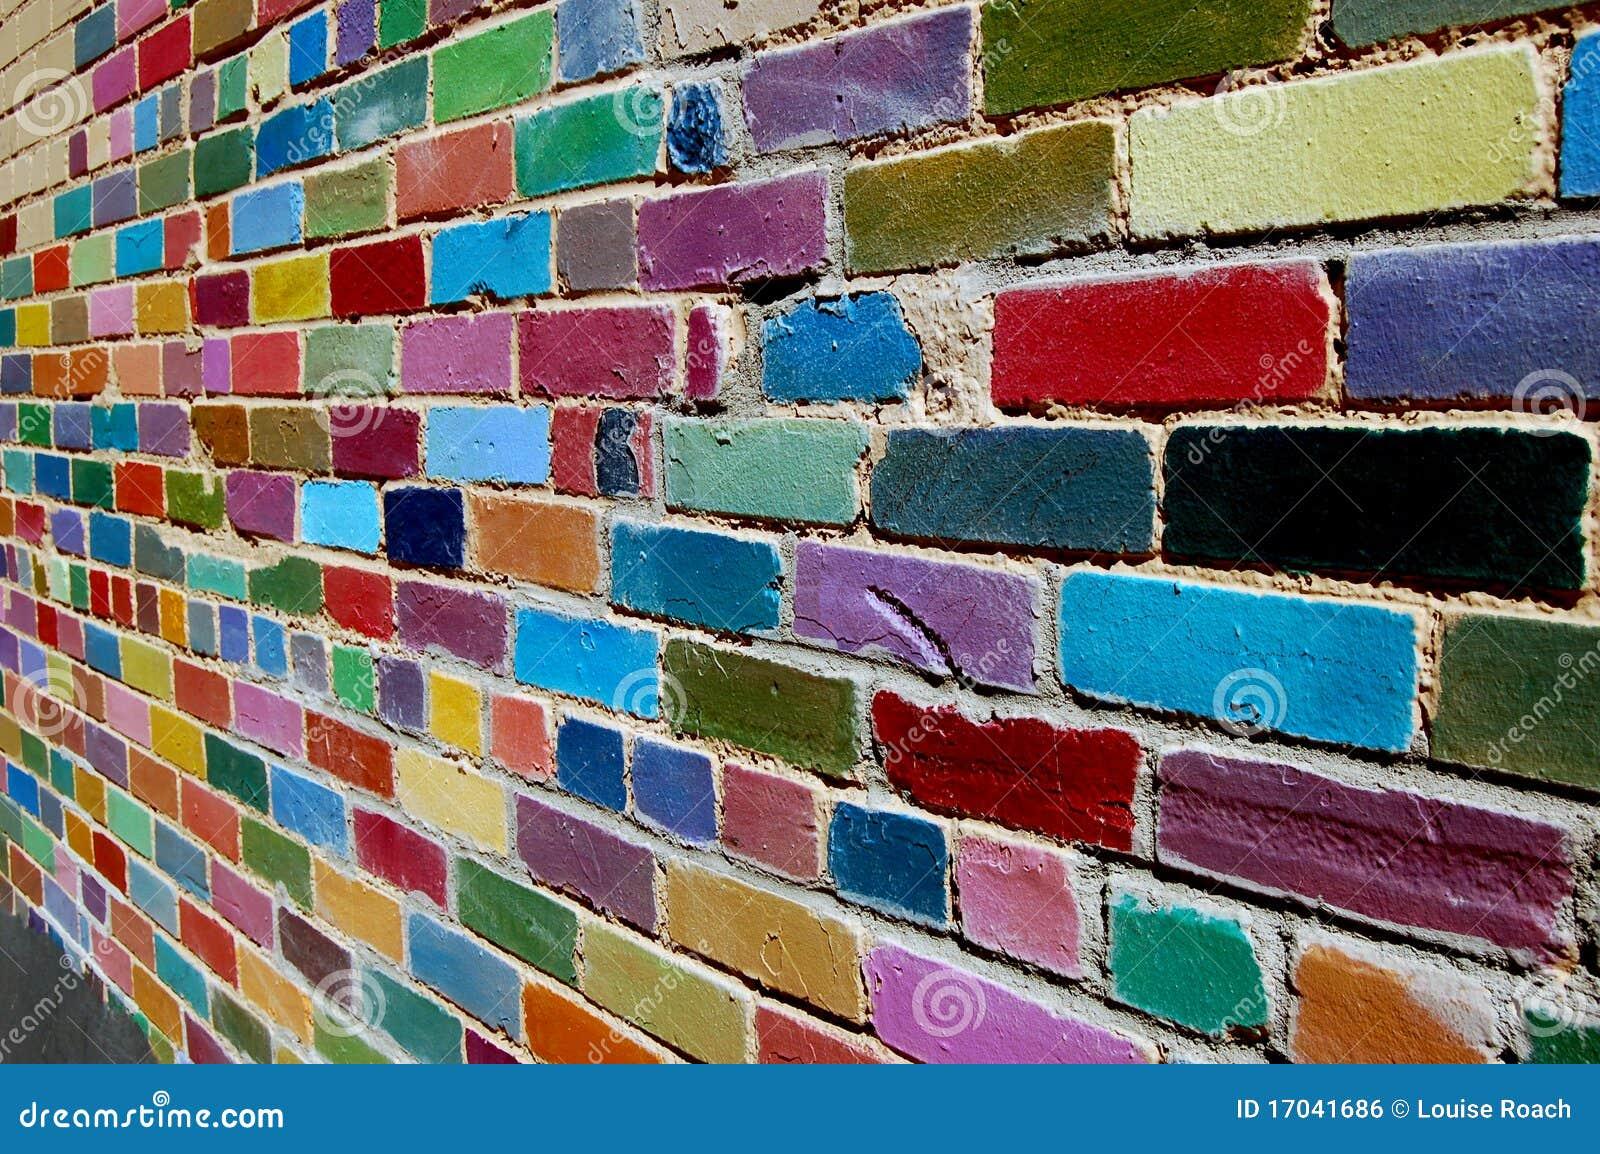 Painted Brick Wall Royalty Free Stock Image Image 17041686